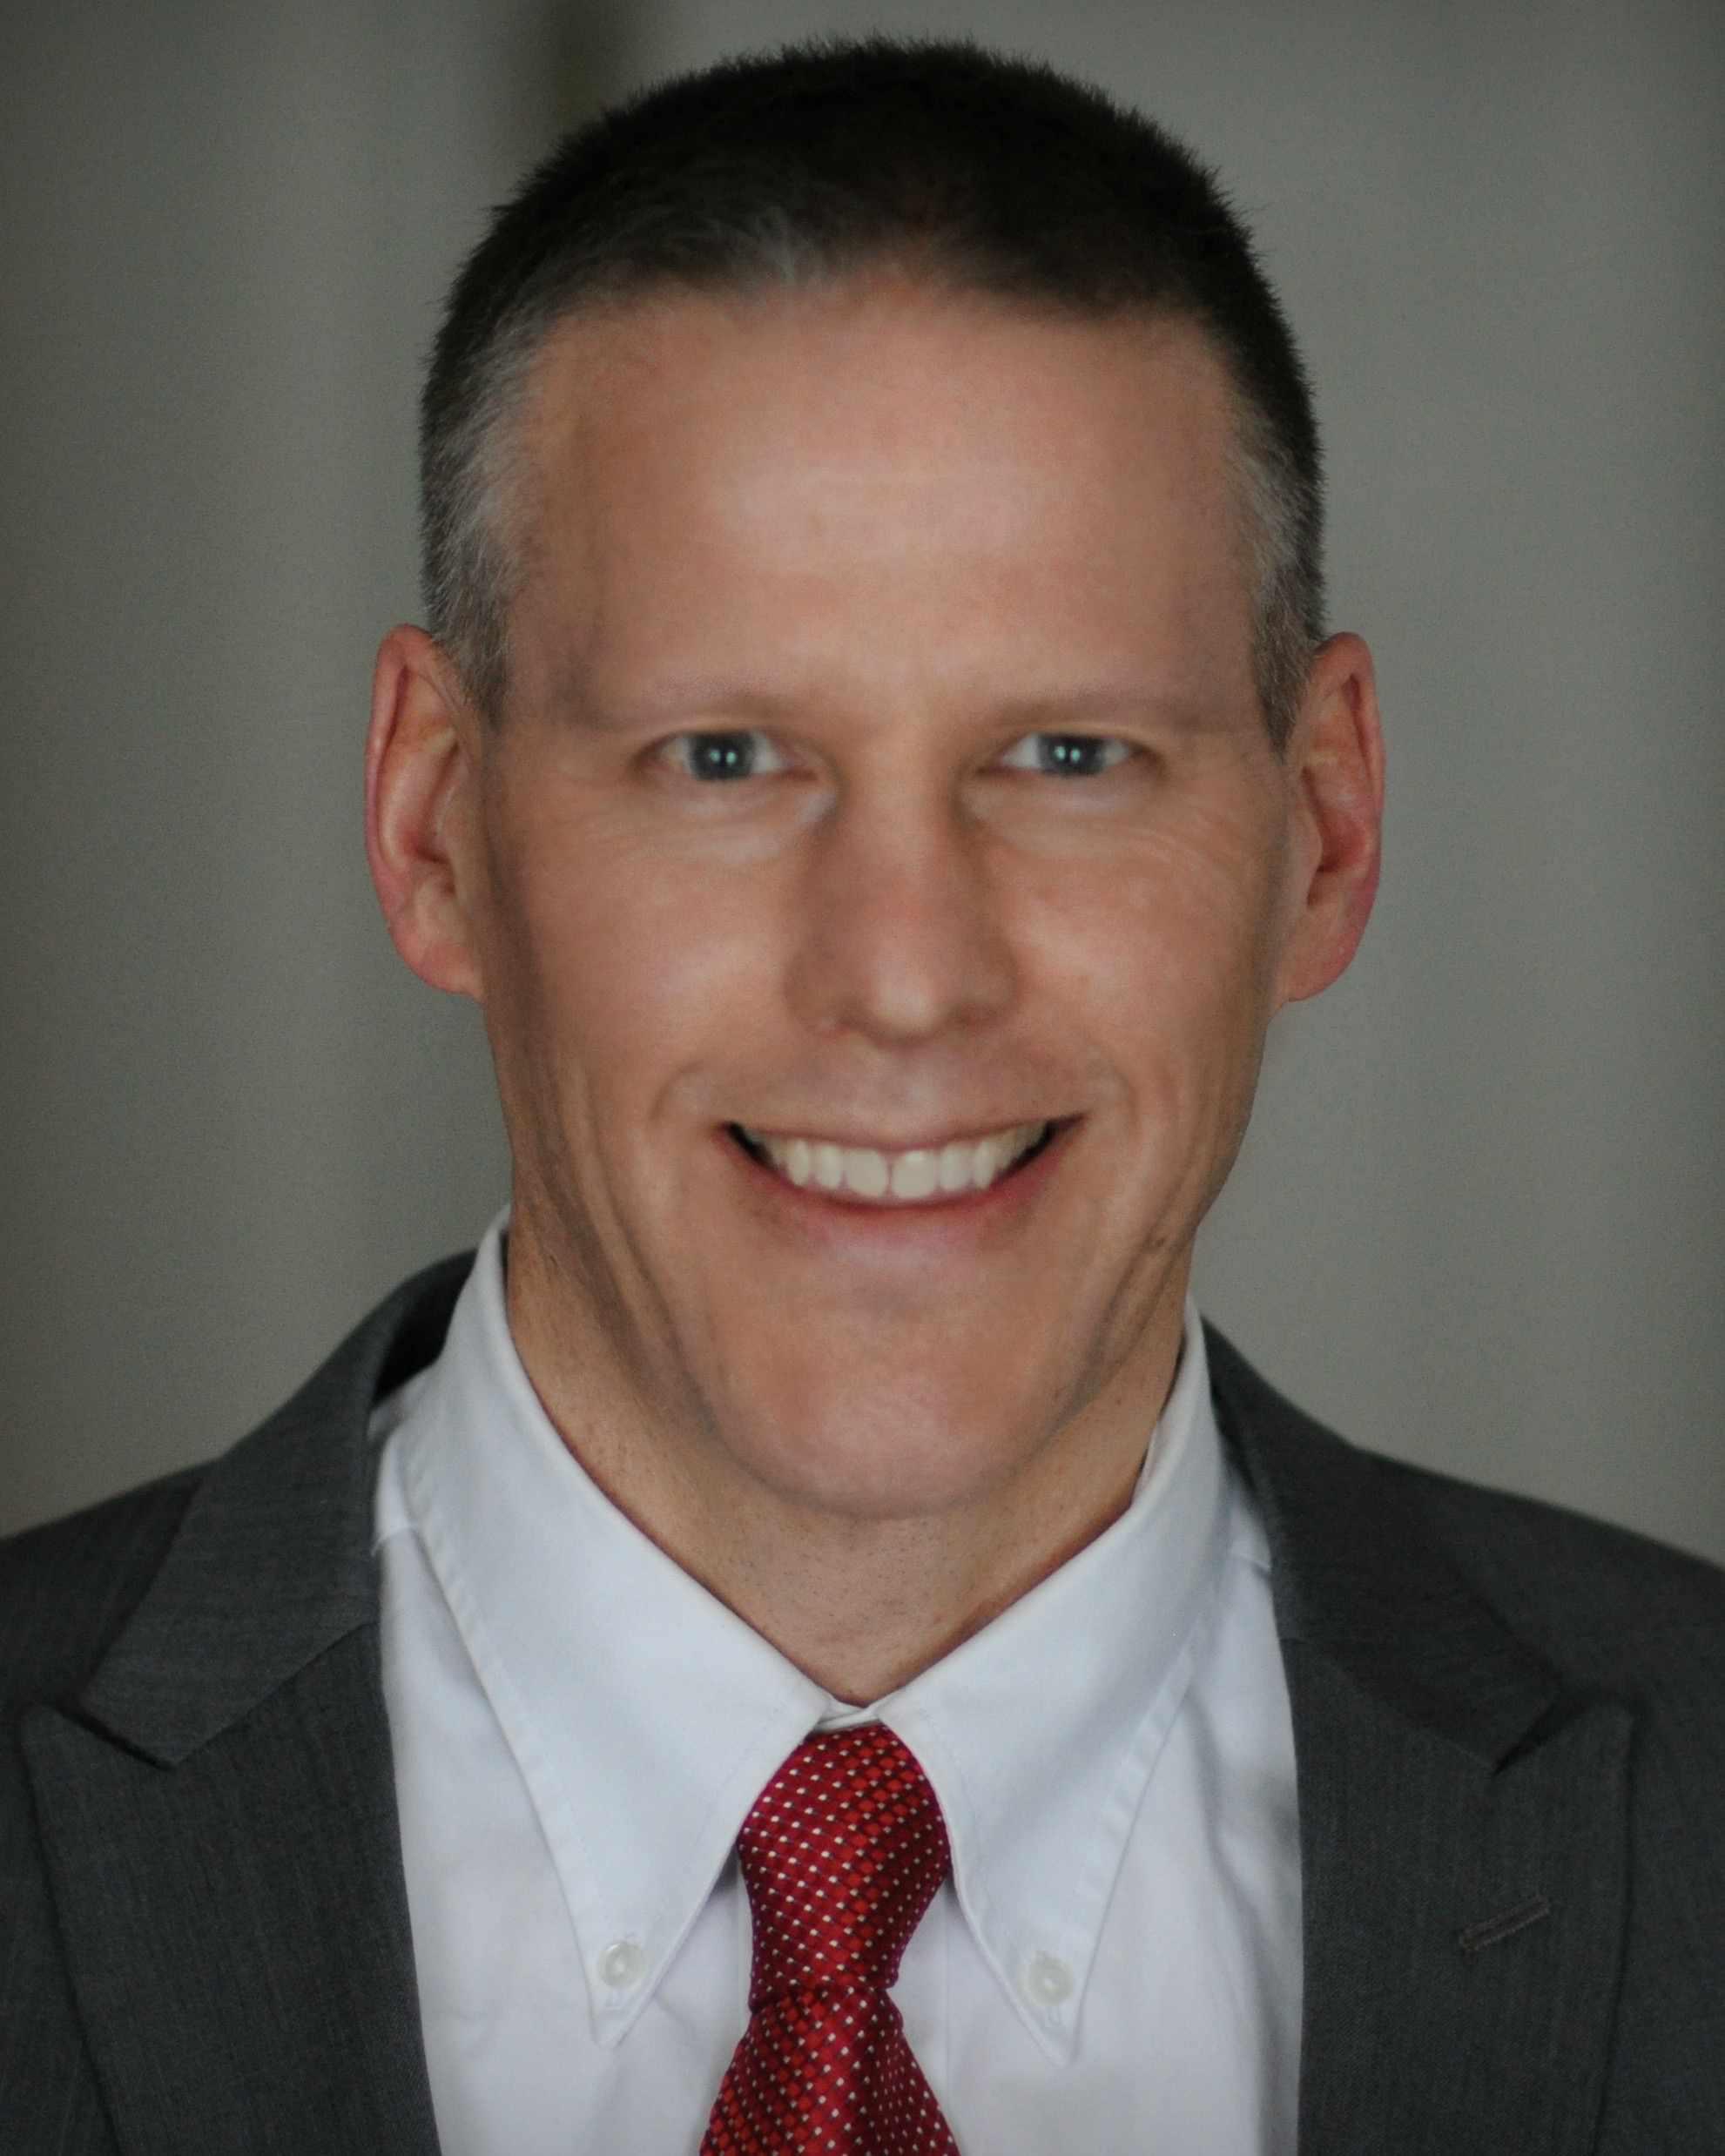 Toby Walters